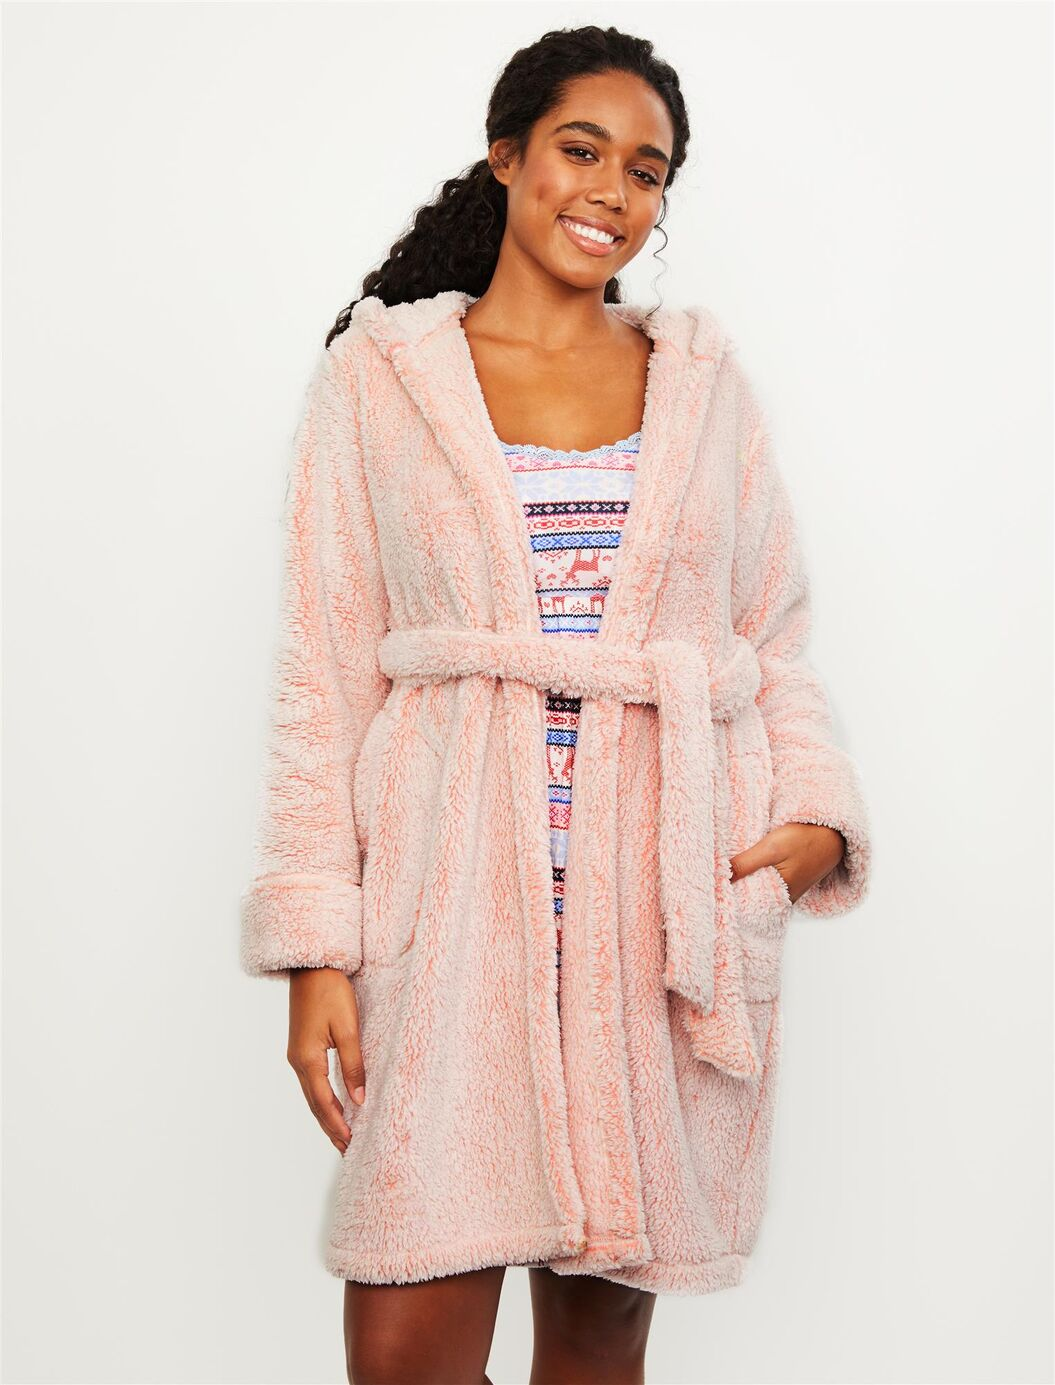 Hooded Cozy Sleep Maternity Robe